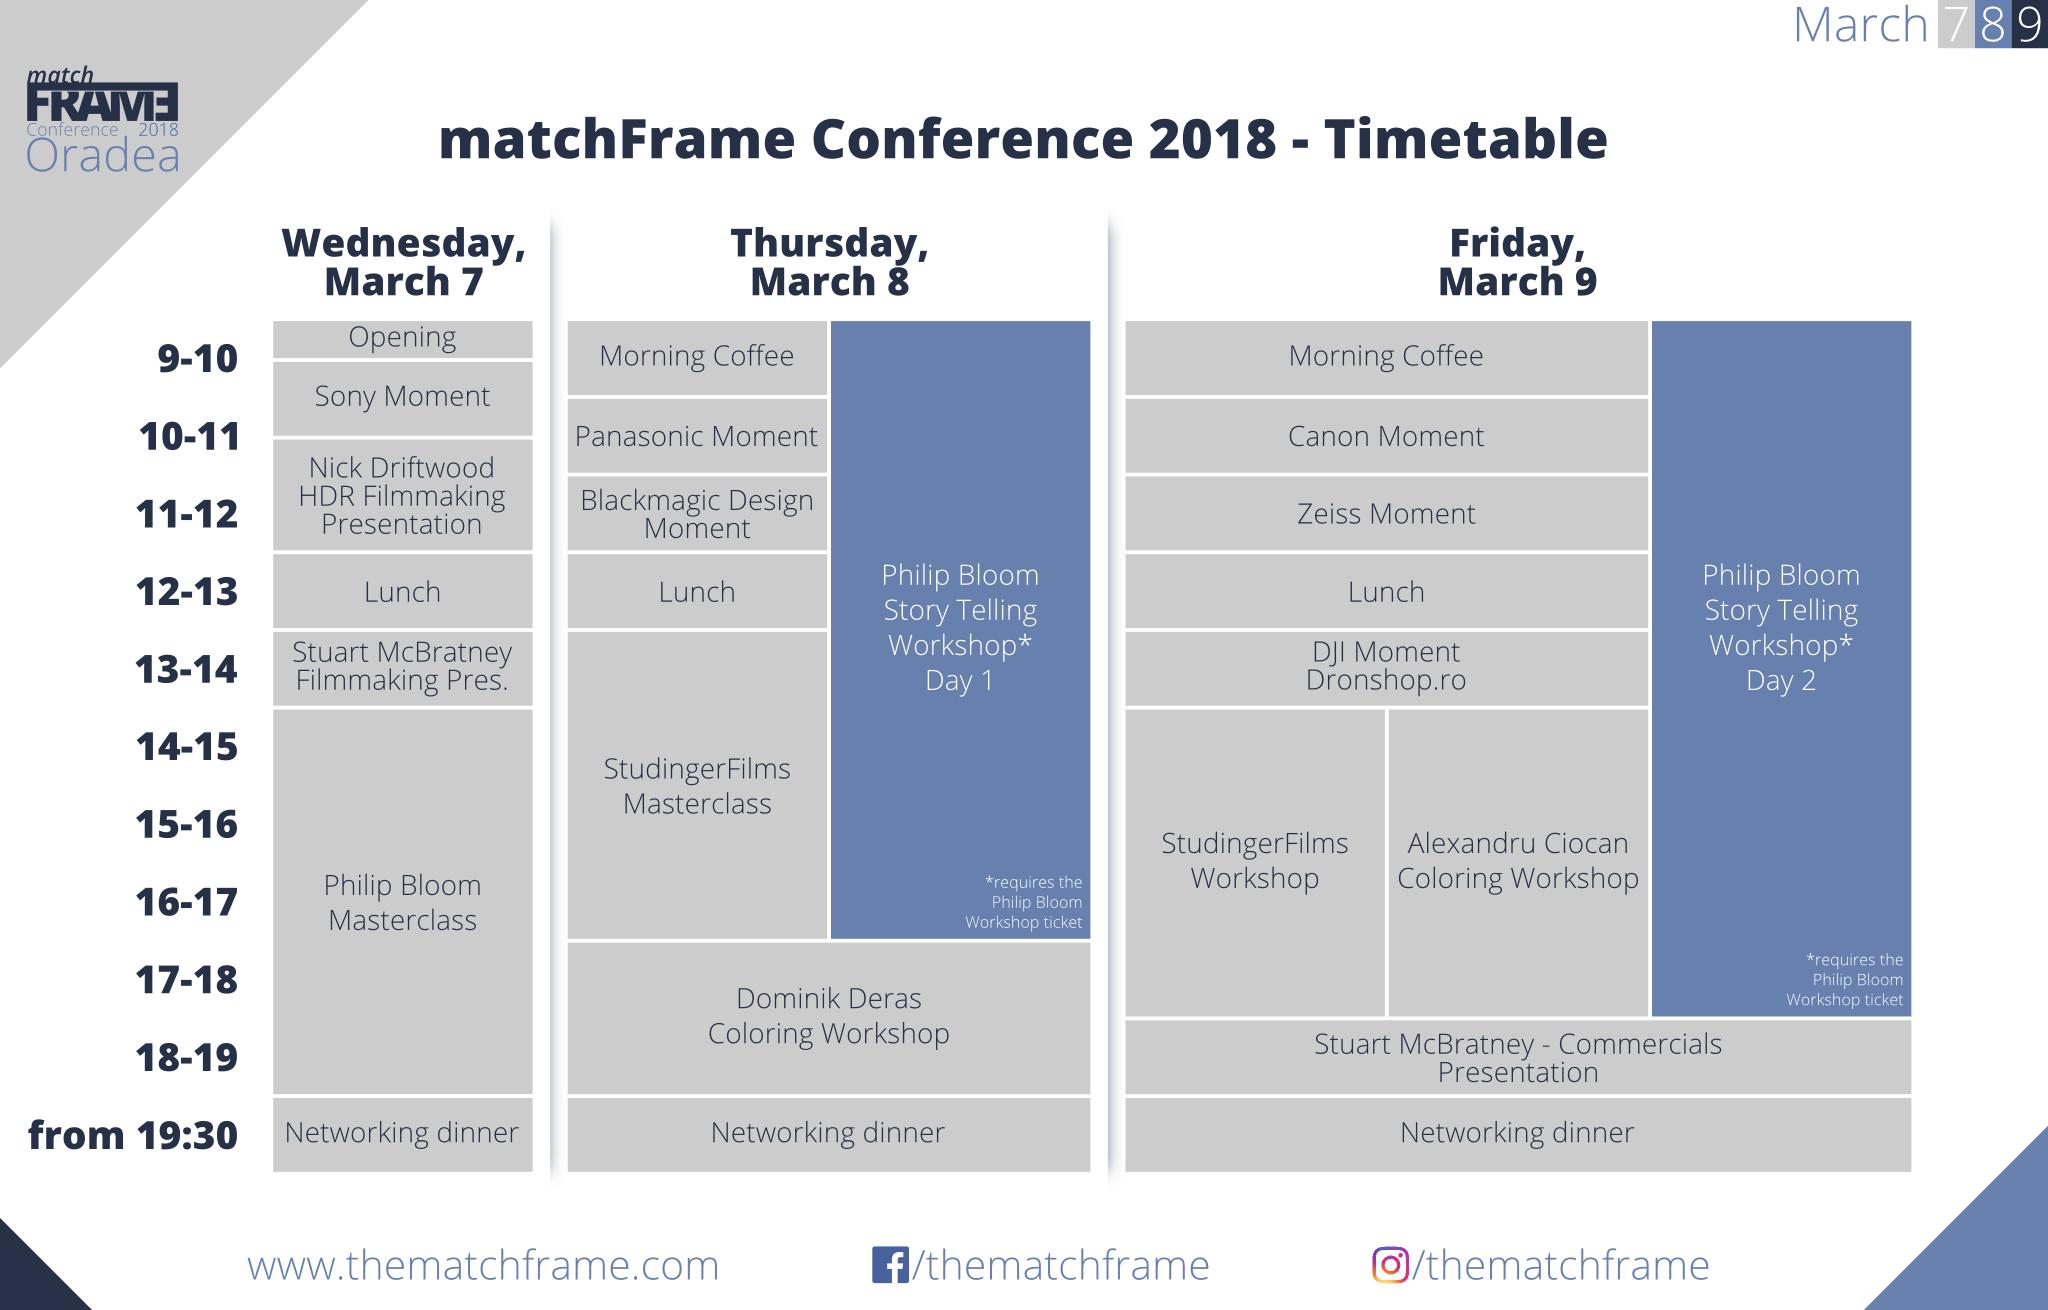 matchFRAME - Program